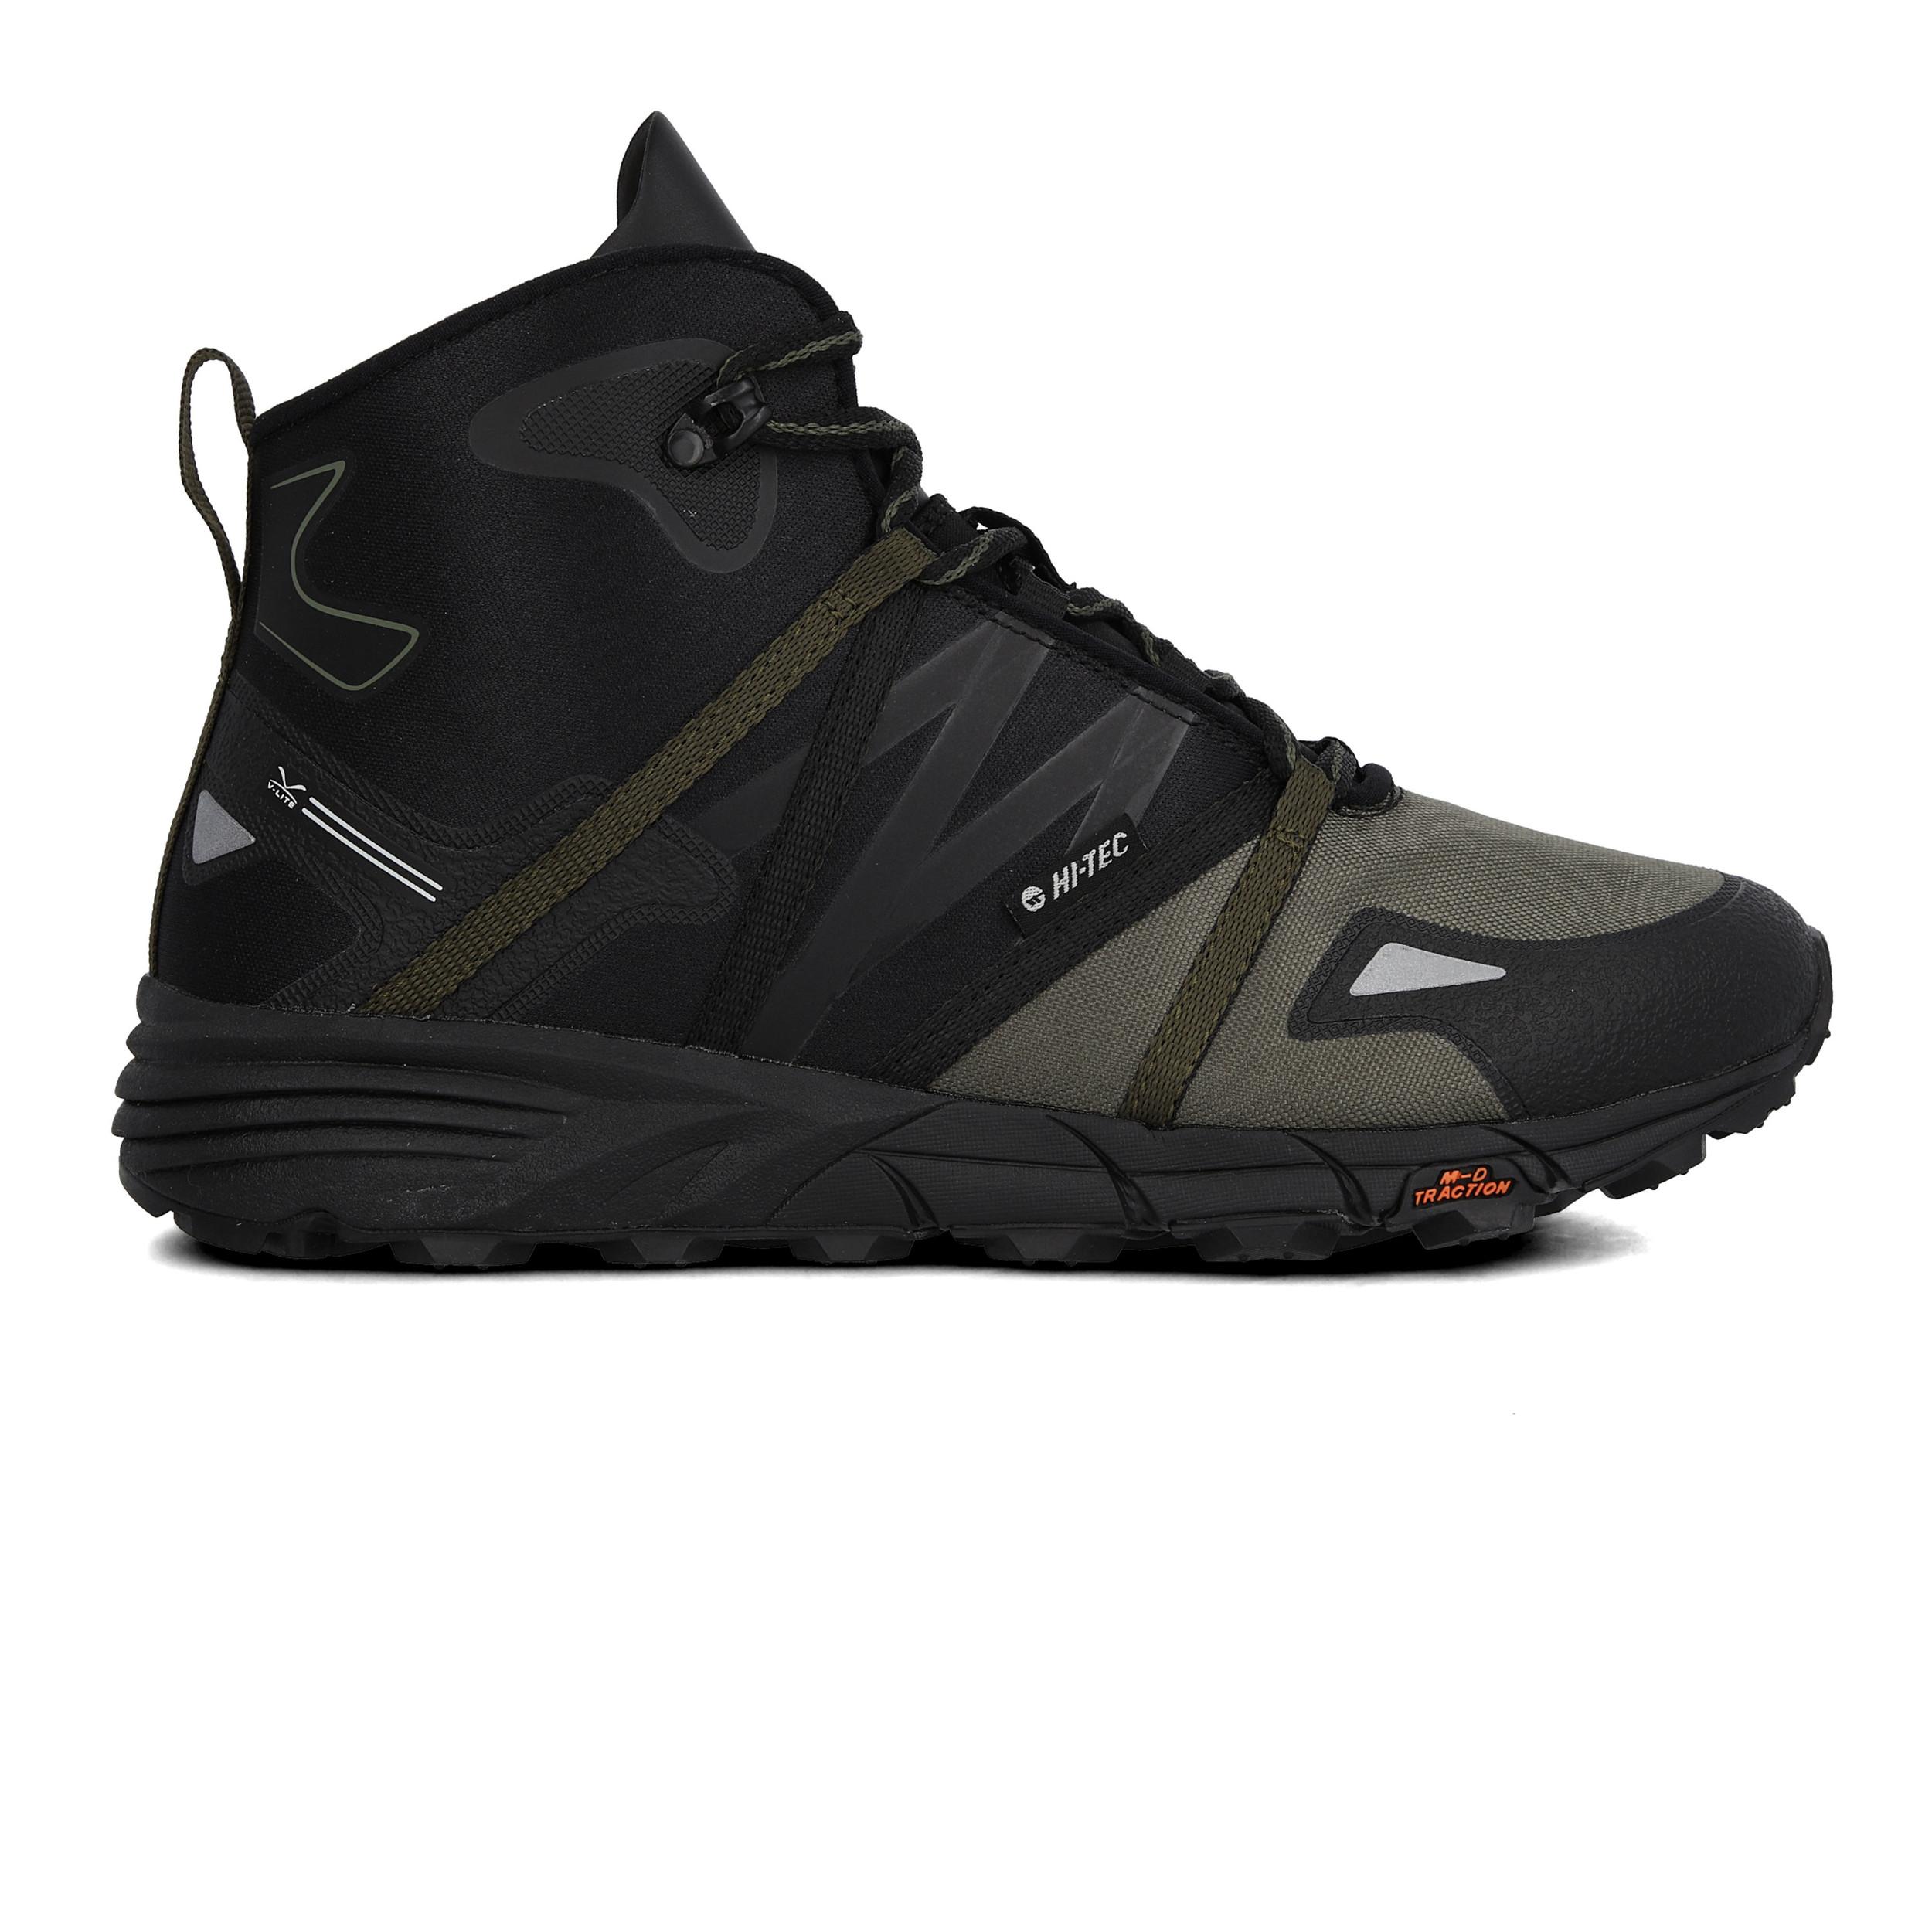 Hi Tec Para Hombre V Lite Shift Botas Para Caminar Me Negro Deportes Transpirable Ebay